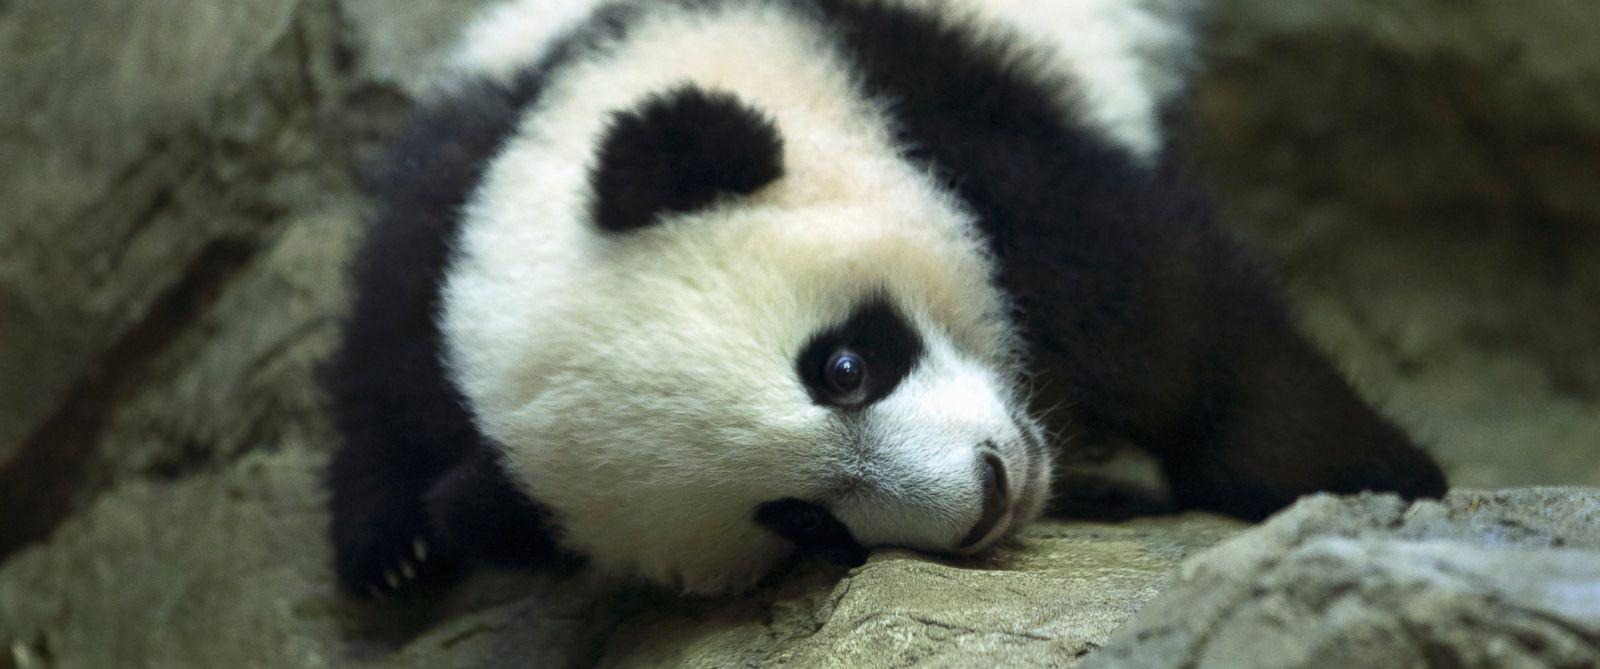 PHOTO: Giant panda cub Bei Bei, seen through glass, roams in his pen at the National Zoo in Washington, Jan. 16, 2016.